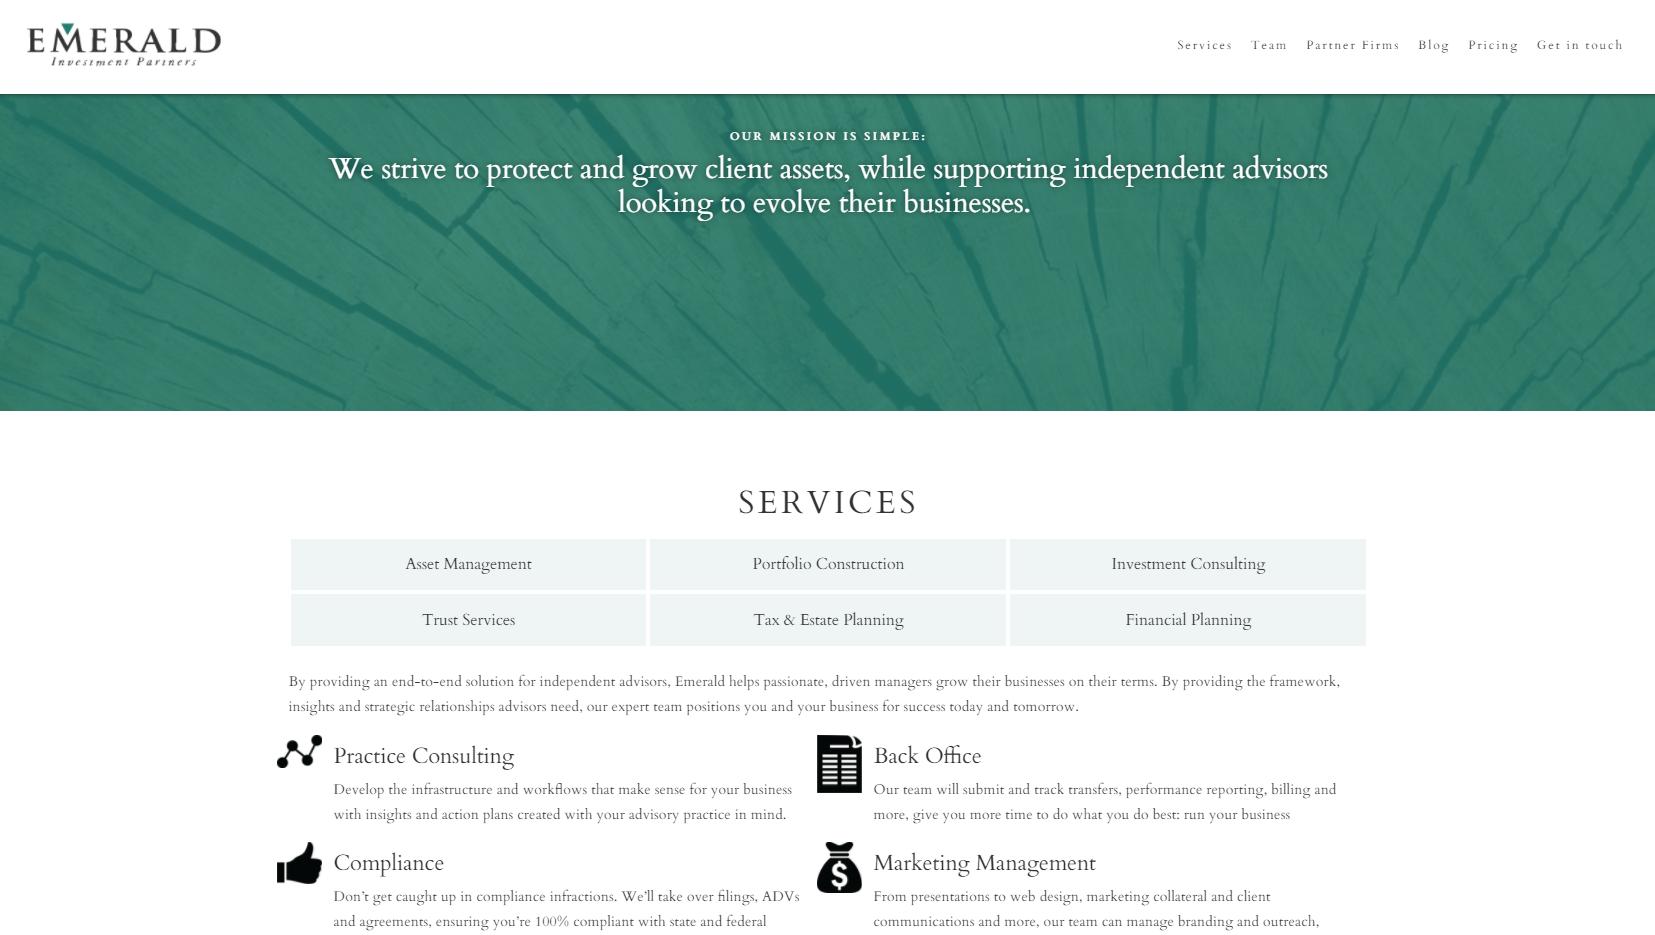 emerald investment partners financial advisor website